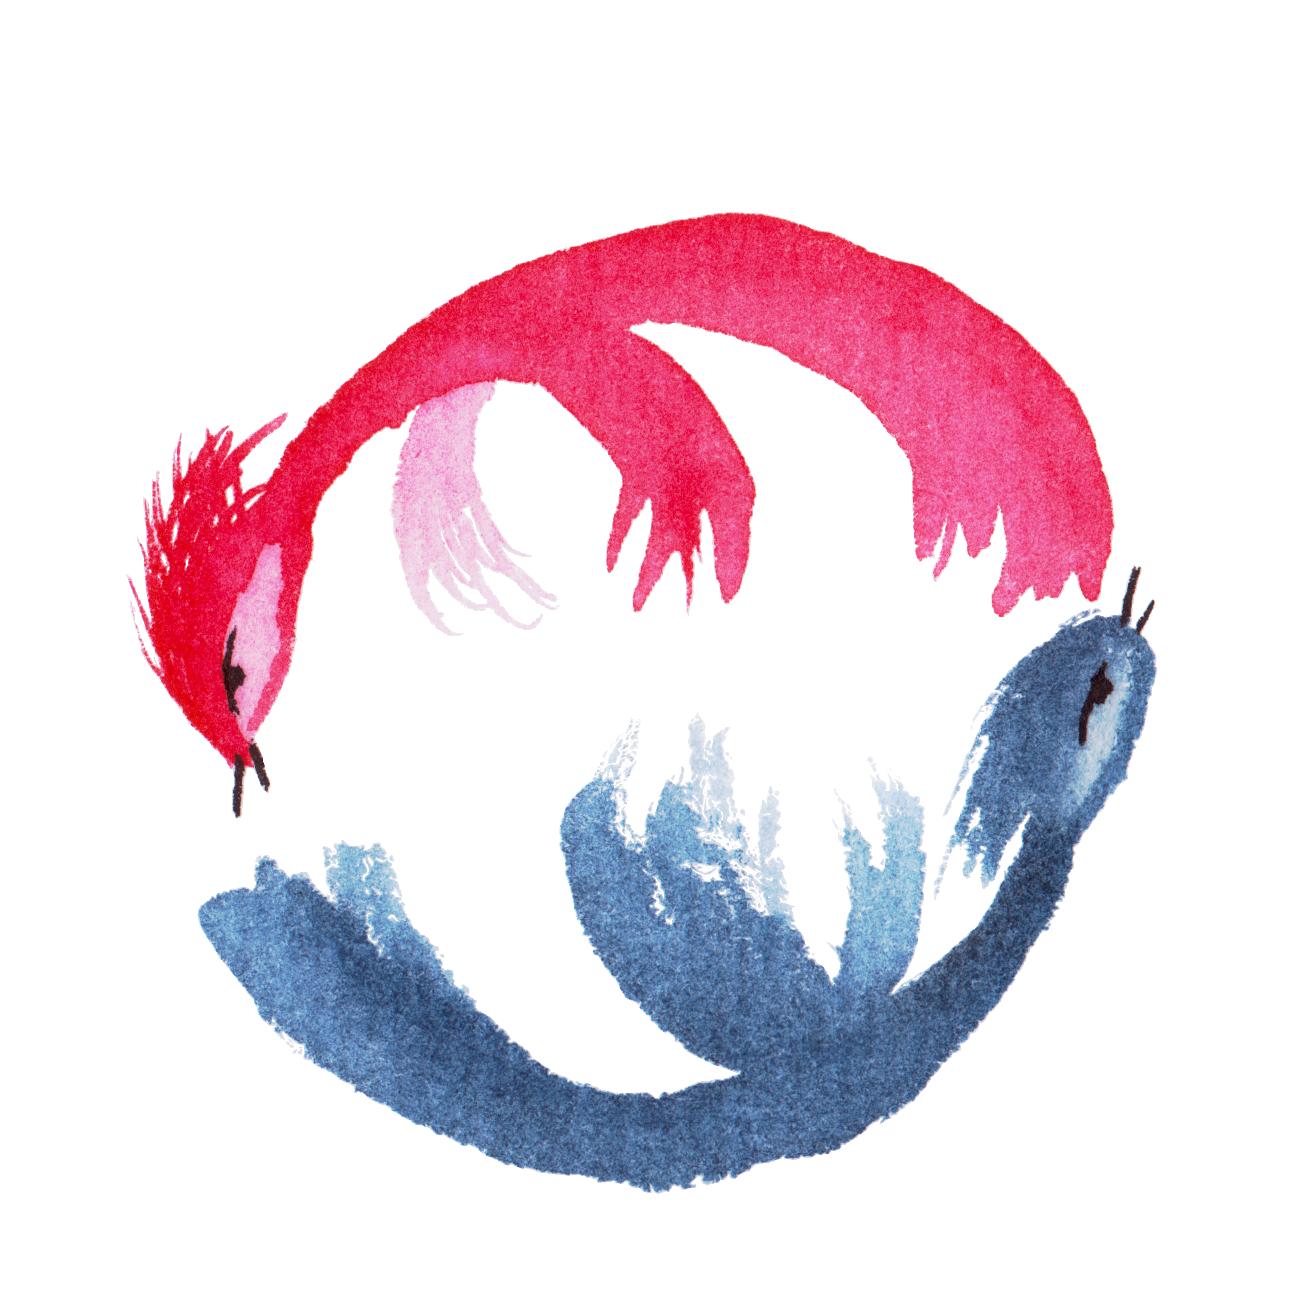 Fèng Huáng Practice